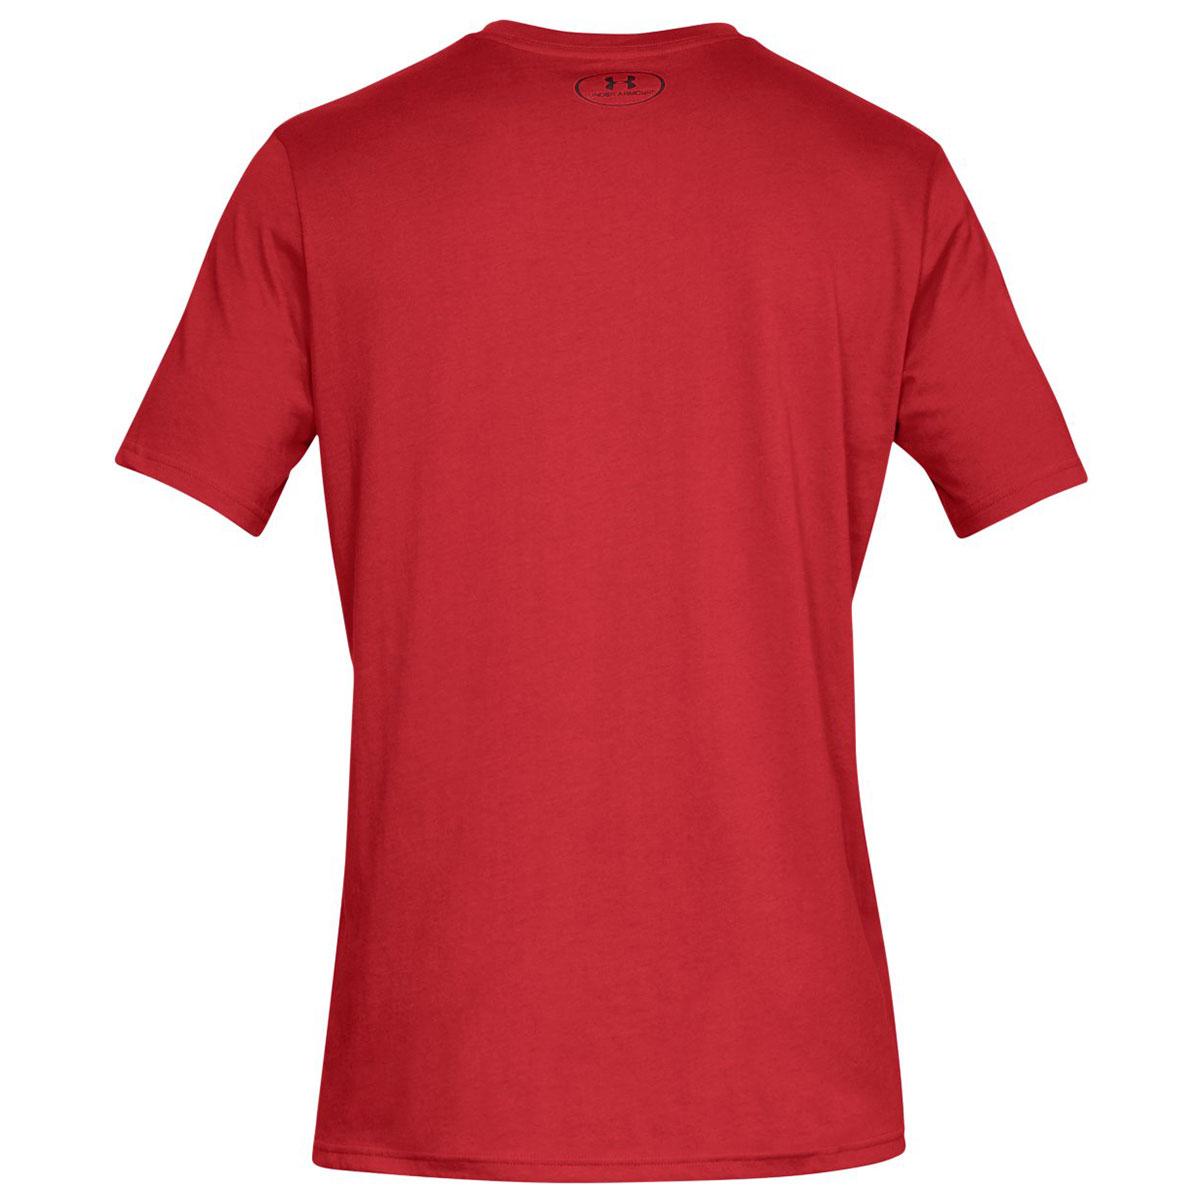 Under-Armour-Mens-2019-UA-Boxed-Sportstyle-HeatGear-Training-Gym-T-Shirt-Tee thumbnail 13